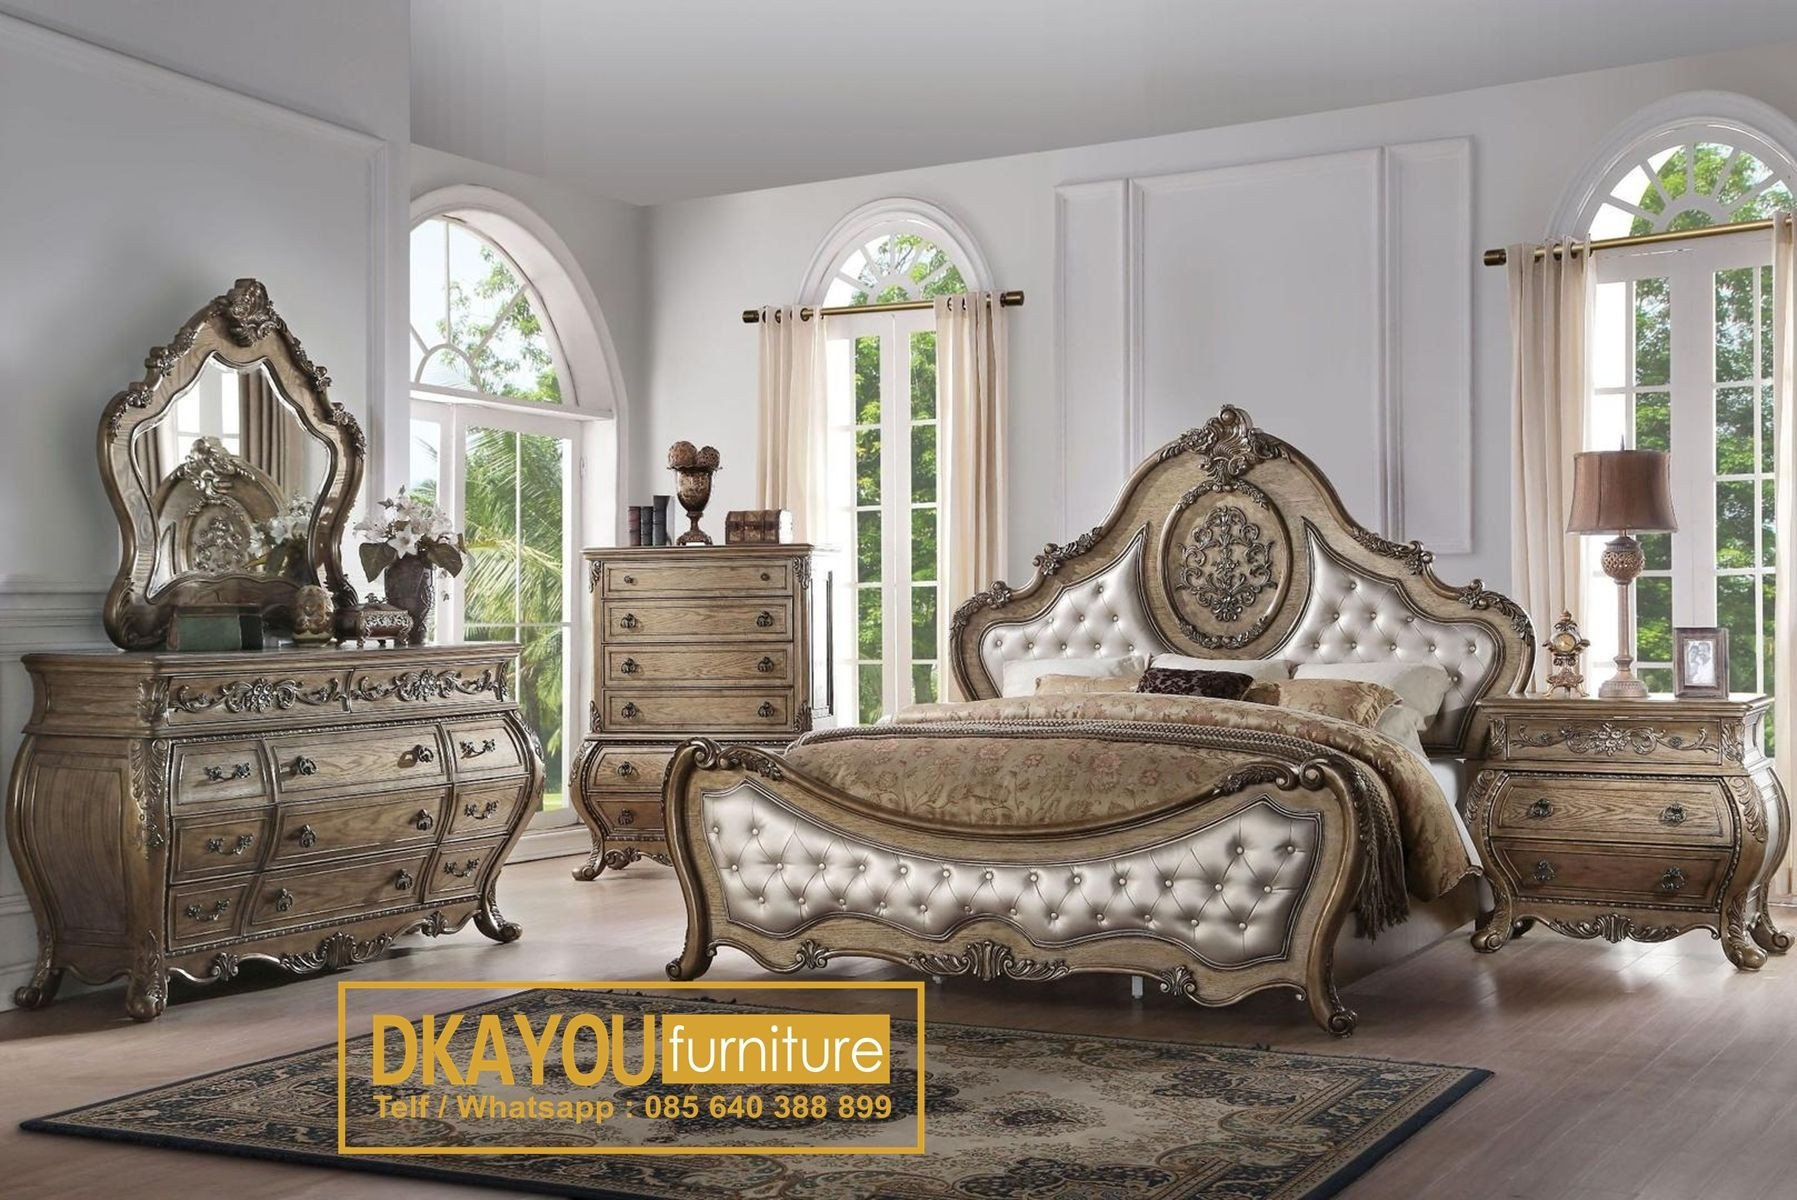 Michael Amini Bedroom Set Luxury Set Kamar Tidur Mewah Klasik Eropa Terbaru Royal Wedding Bed